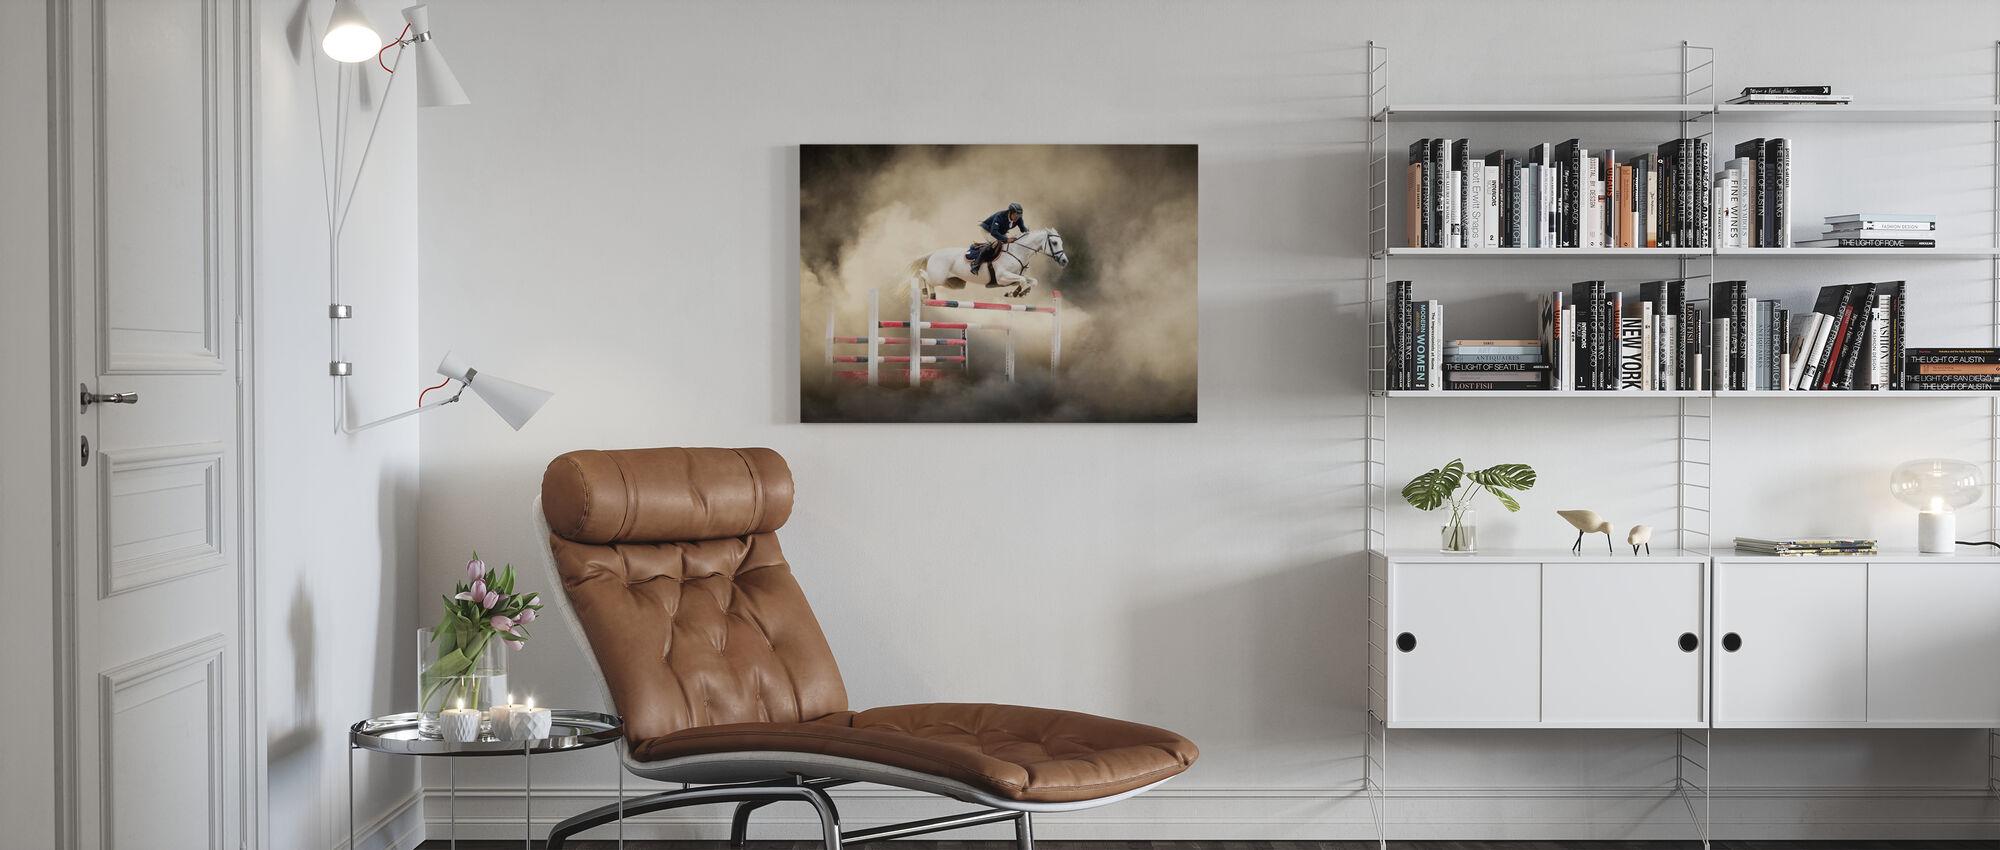 Wit Paard - Canvas print - Woonkamer